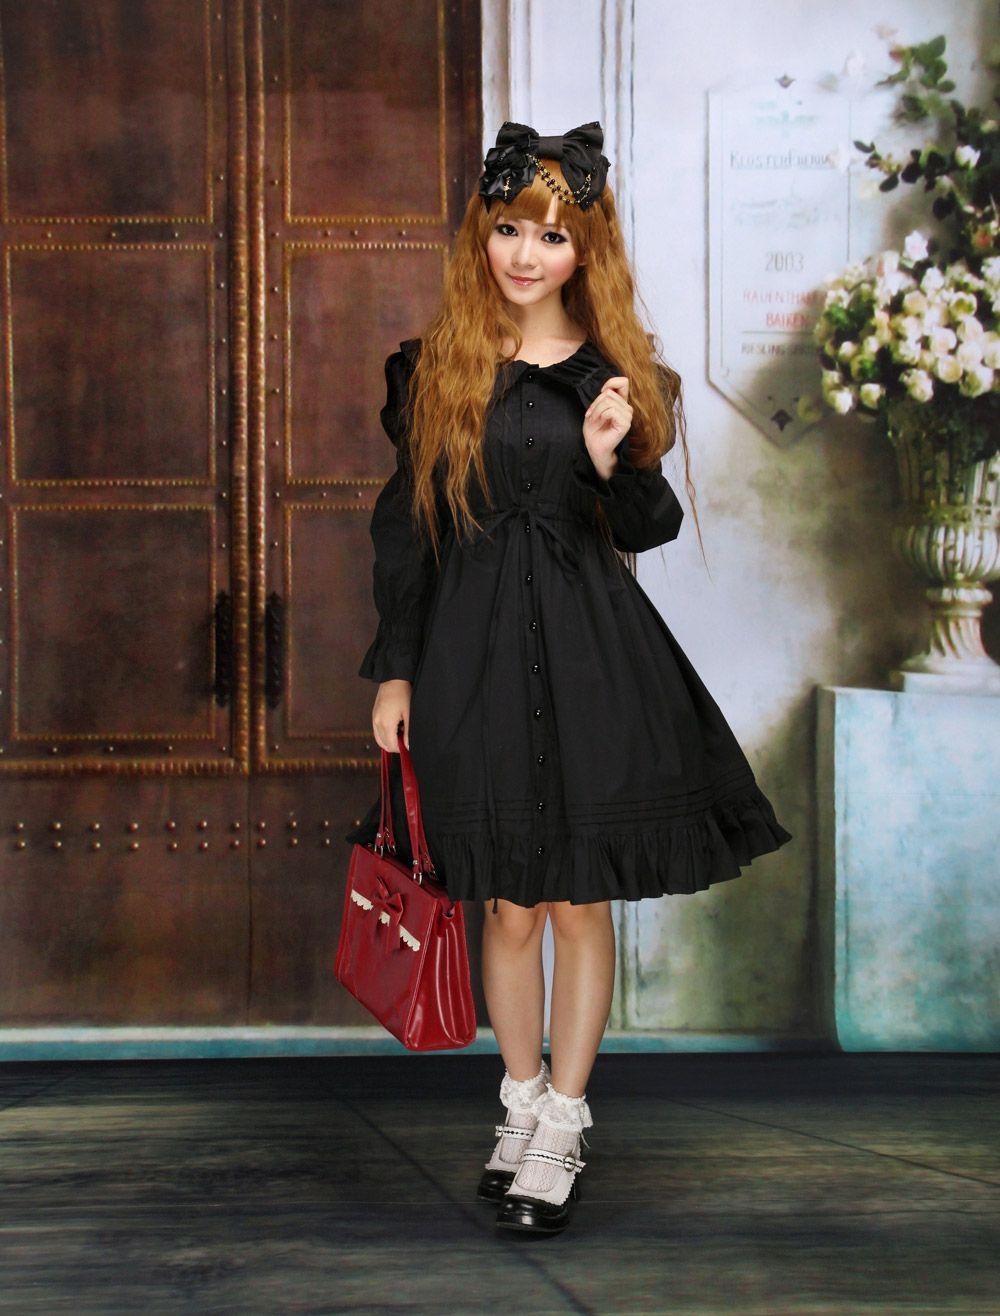 Classic Cotton Black Long Sleeves Ruffles Gothic Lolita Dress